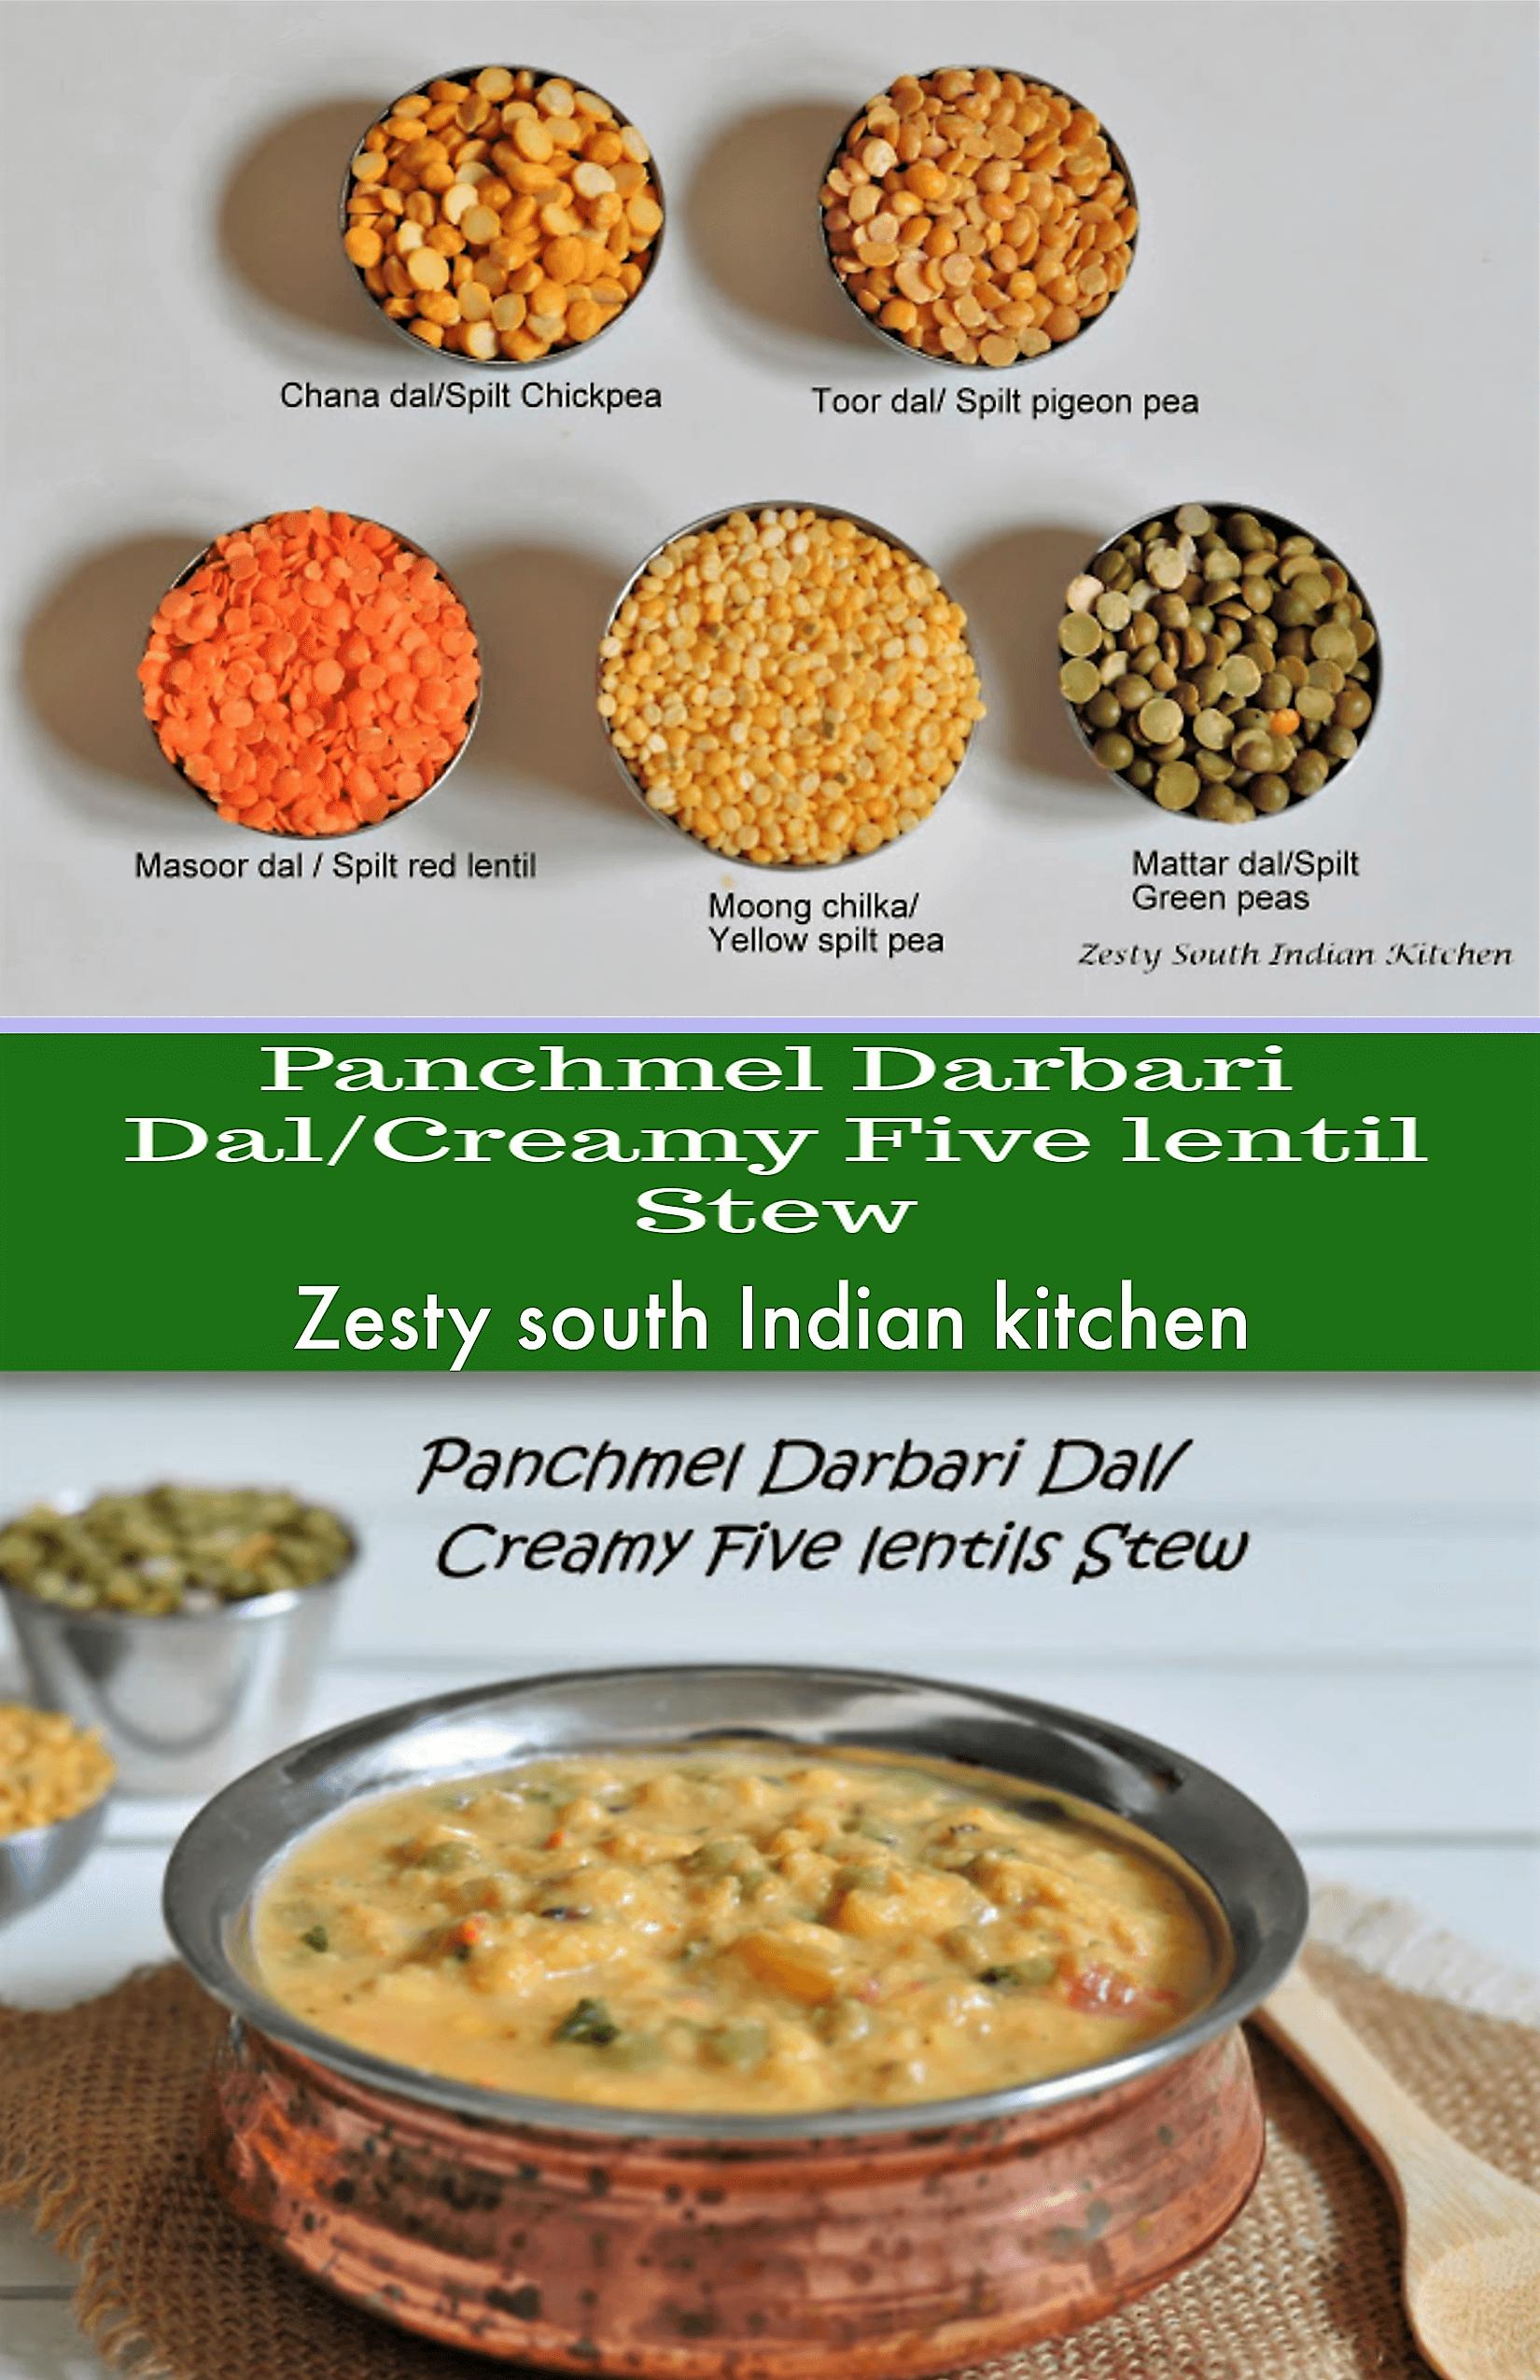 Green Lentil Recipes 25 Delicious Ideas Recipe Green Lentil Recipes Lentil Recipes Lentil Recipes Healthy